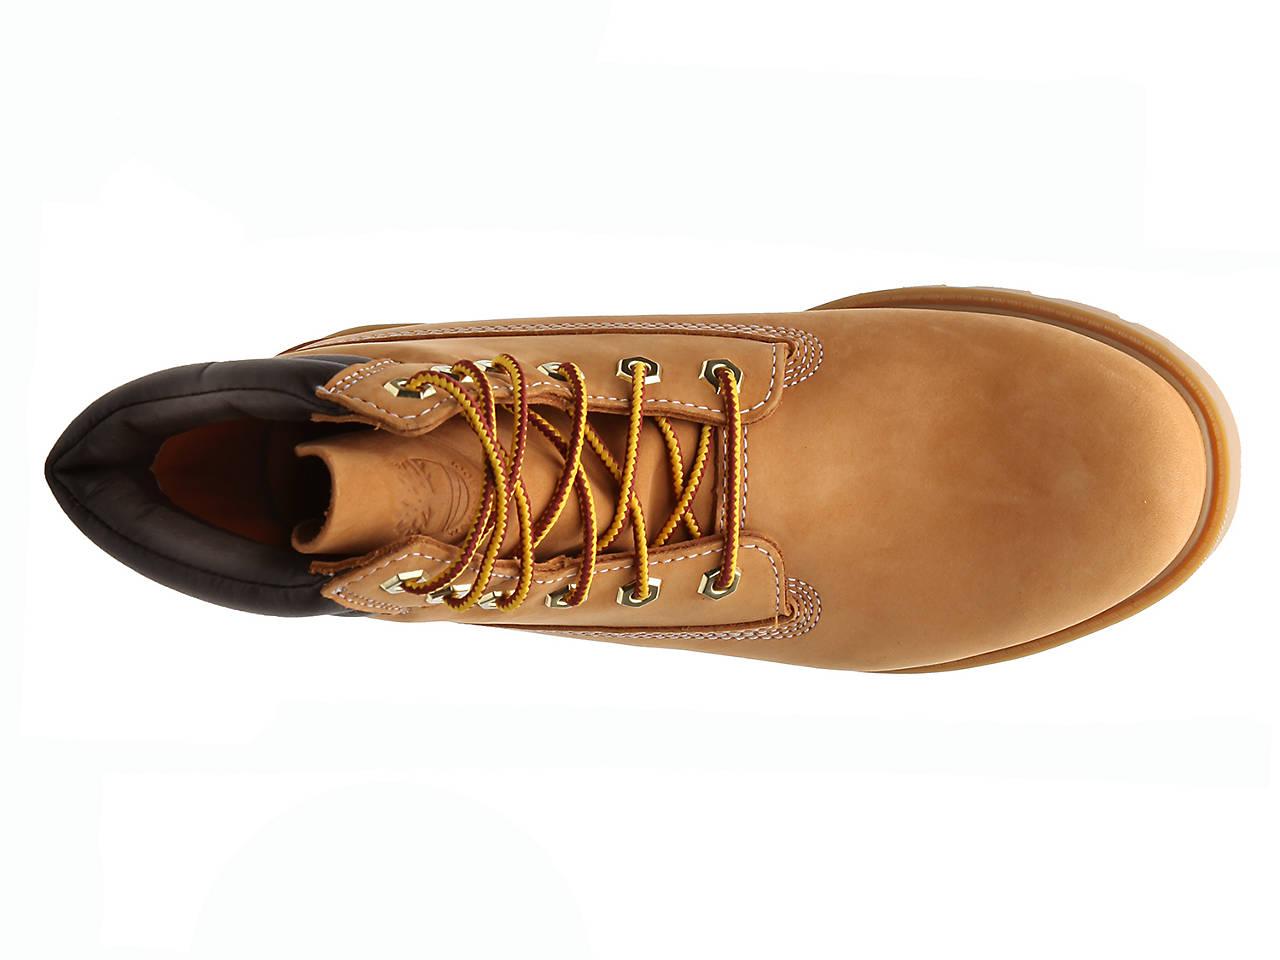 bcf5aab7d7c Timberland Linden Woods Bootie Women s Shoes